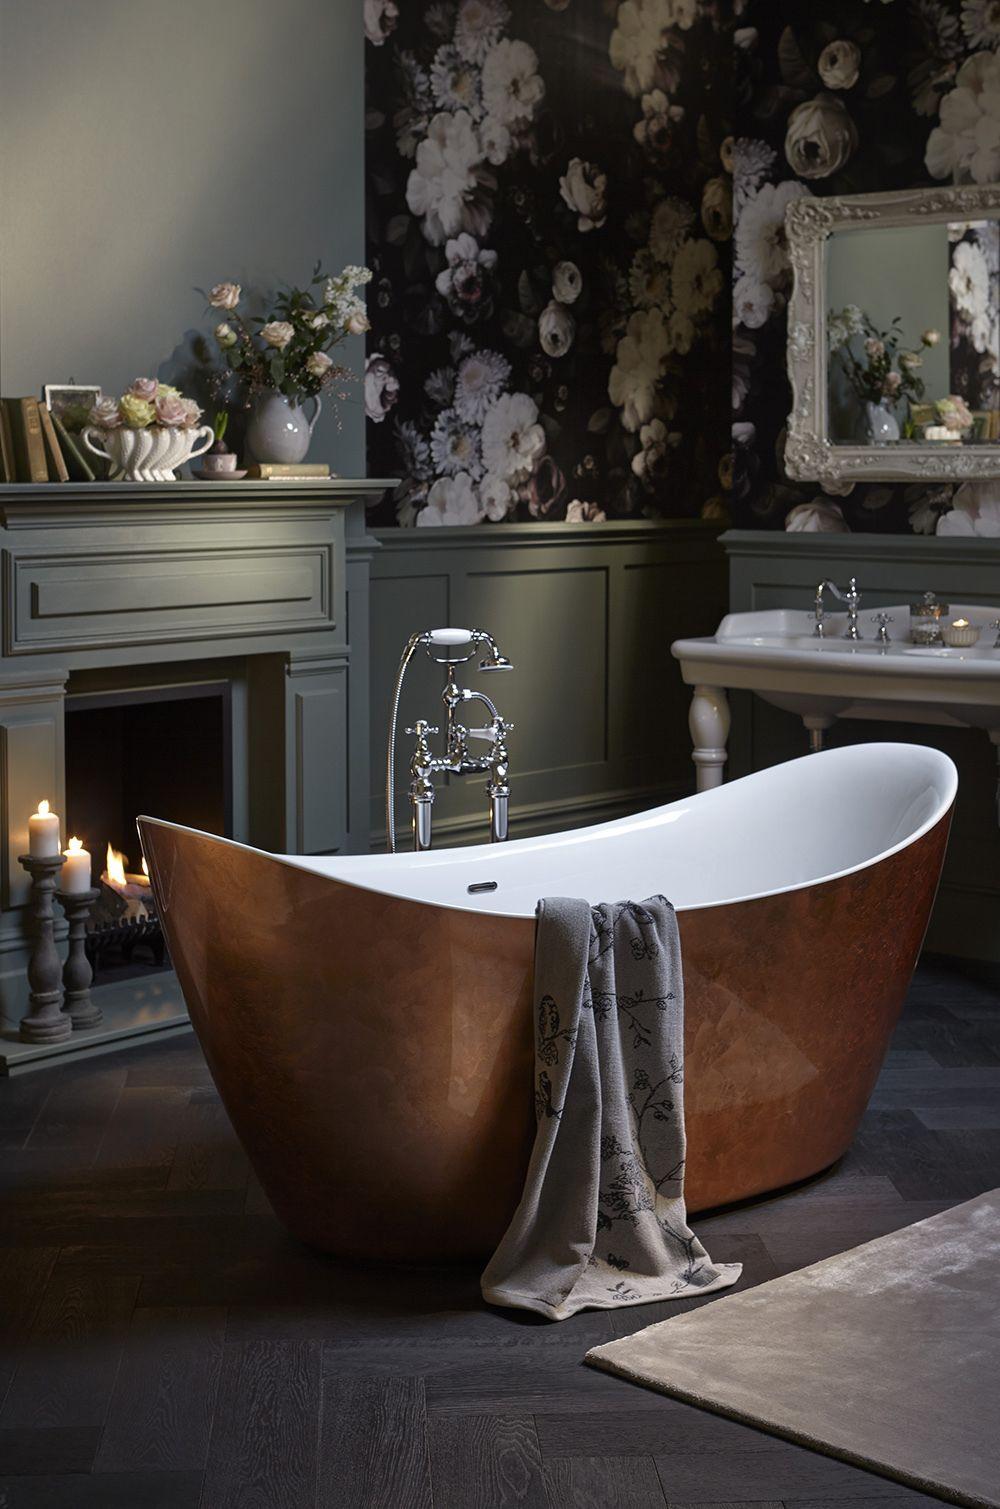 Tecaz bathroom suites - Freestanding Bath